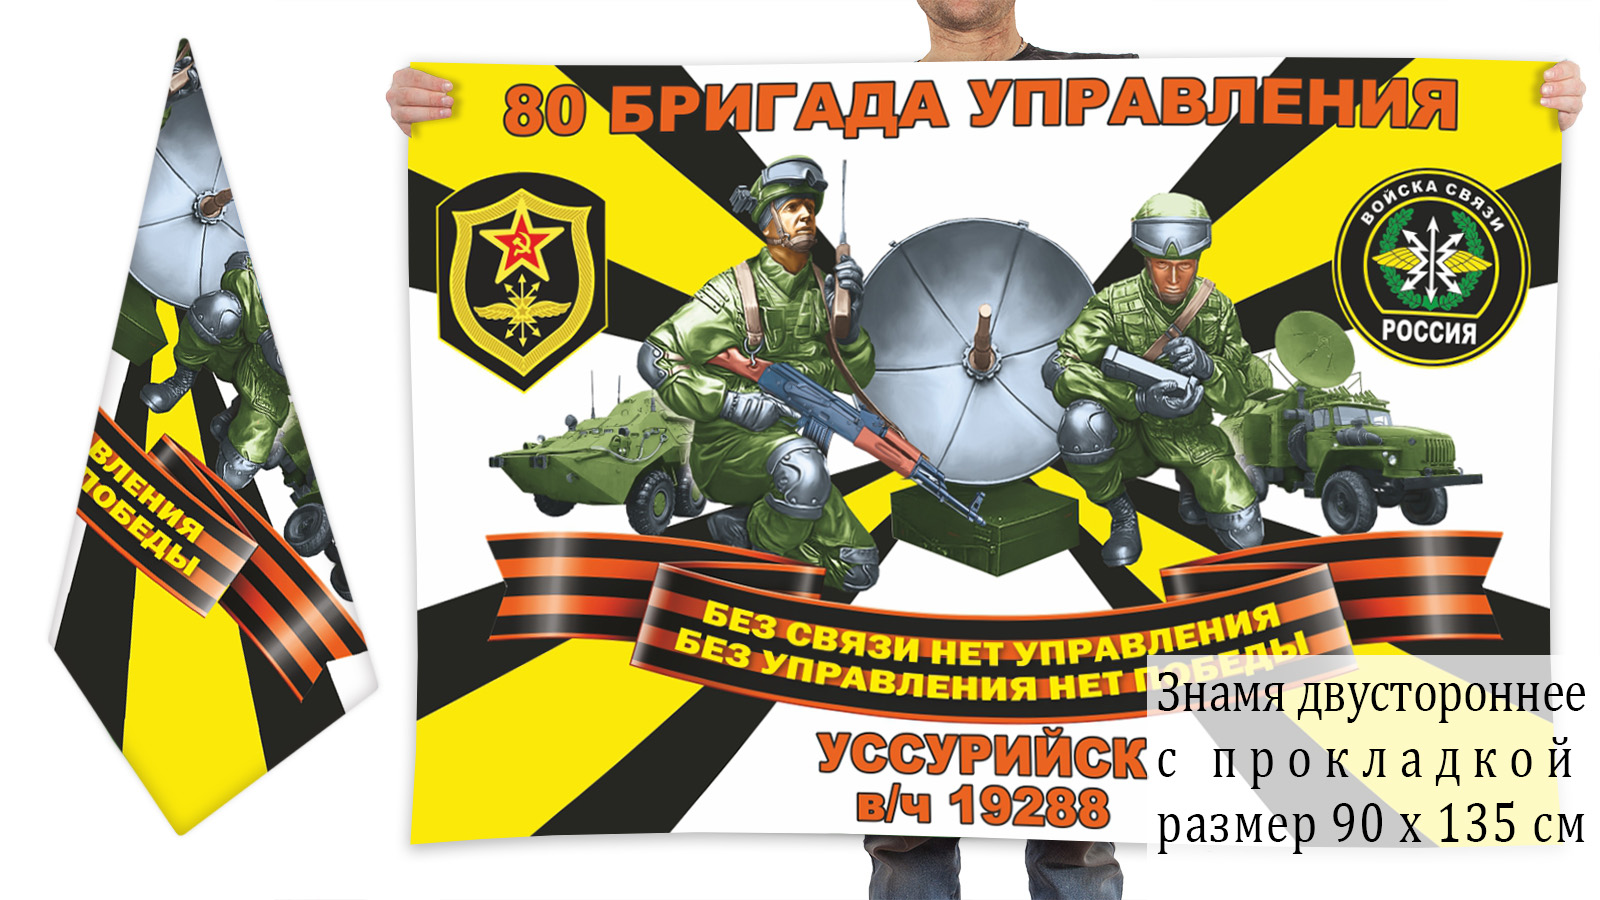 Двусторонний флаг 80 бригада управления войск связи